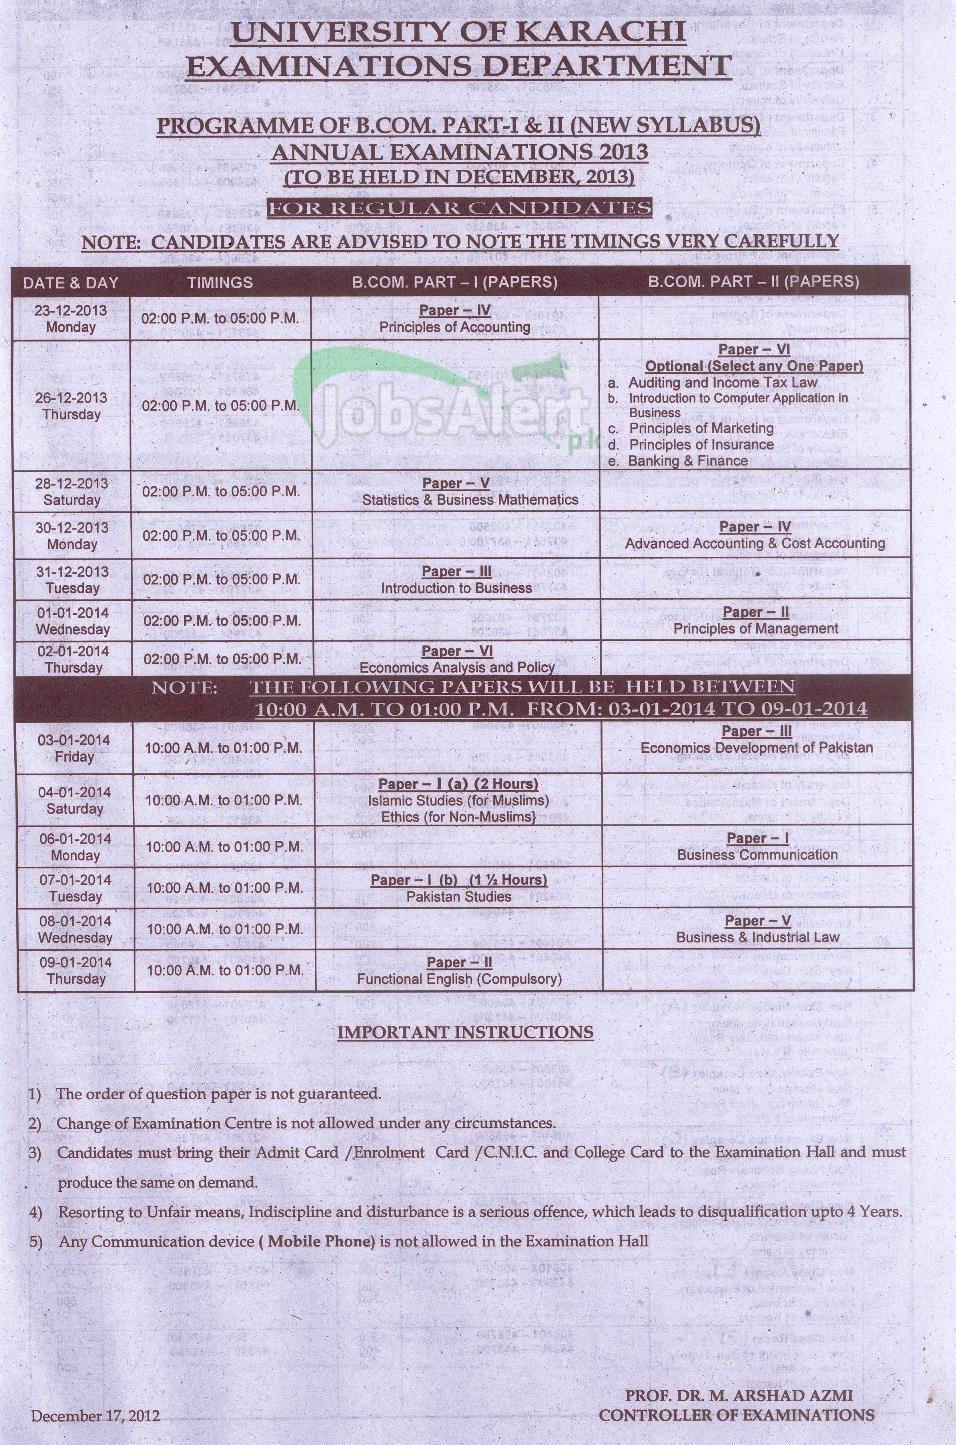 B.Com Part I & II University of Karachi Annual Examination Schedule 2013-2014